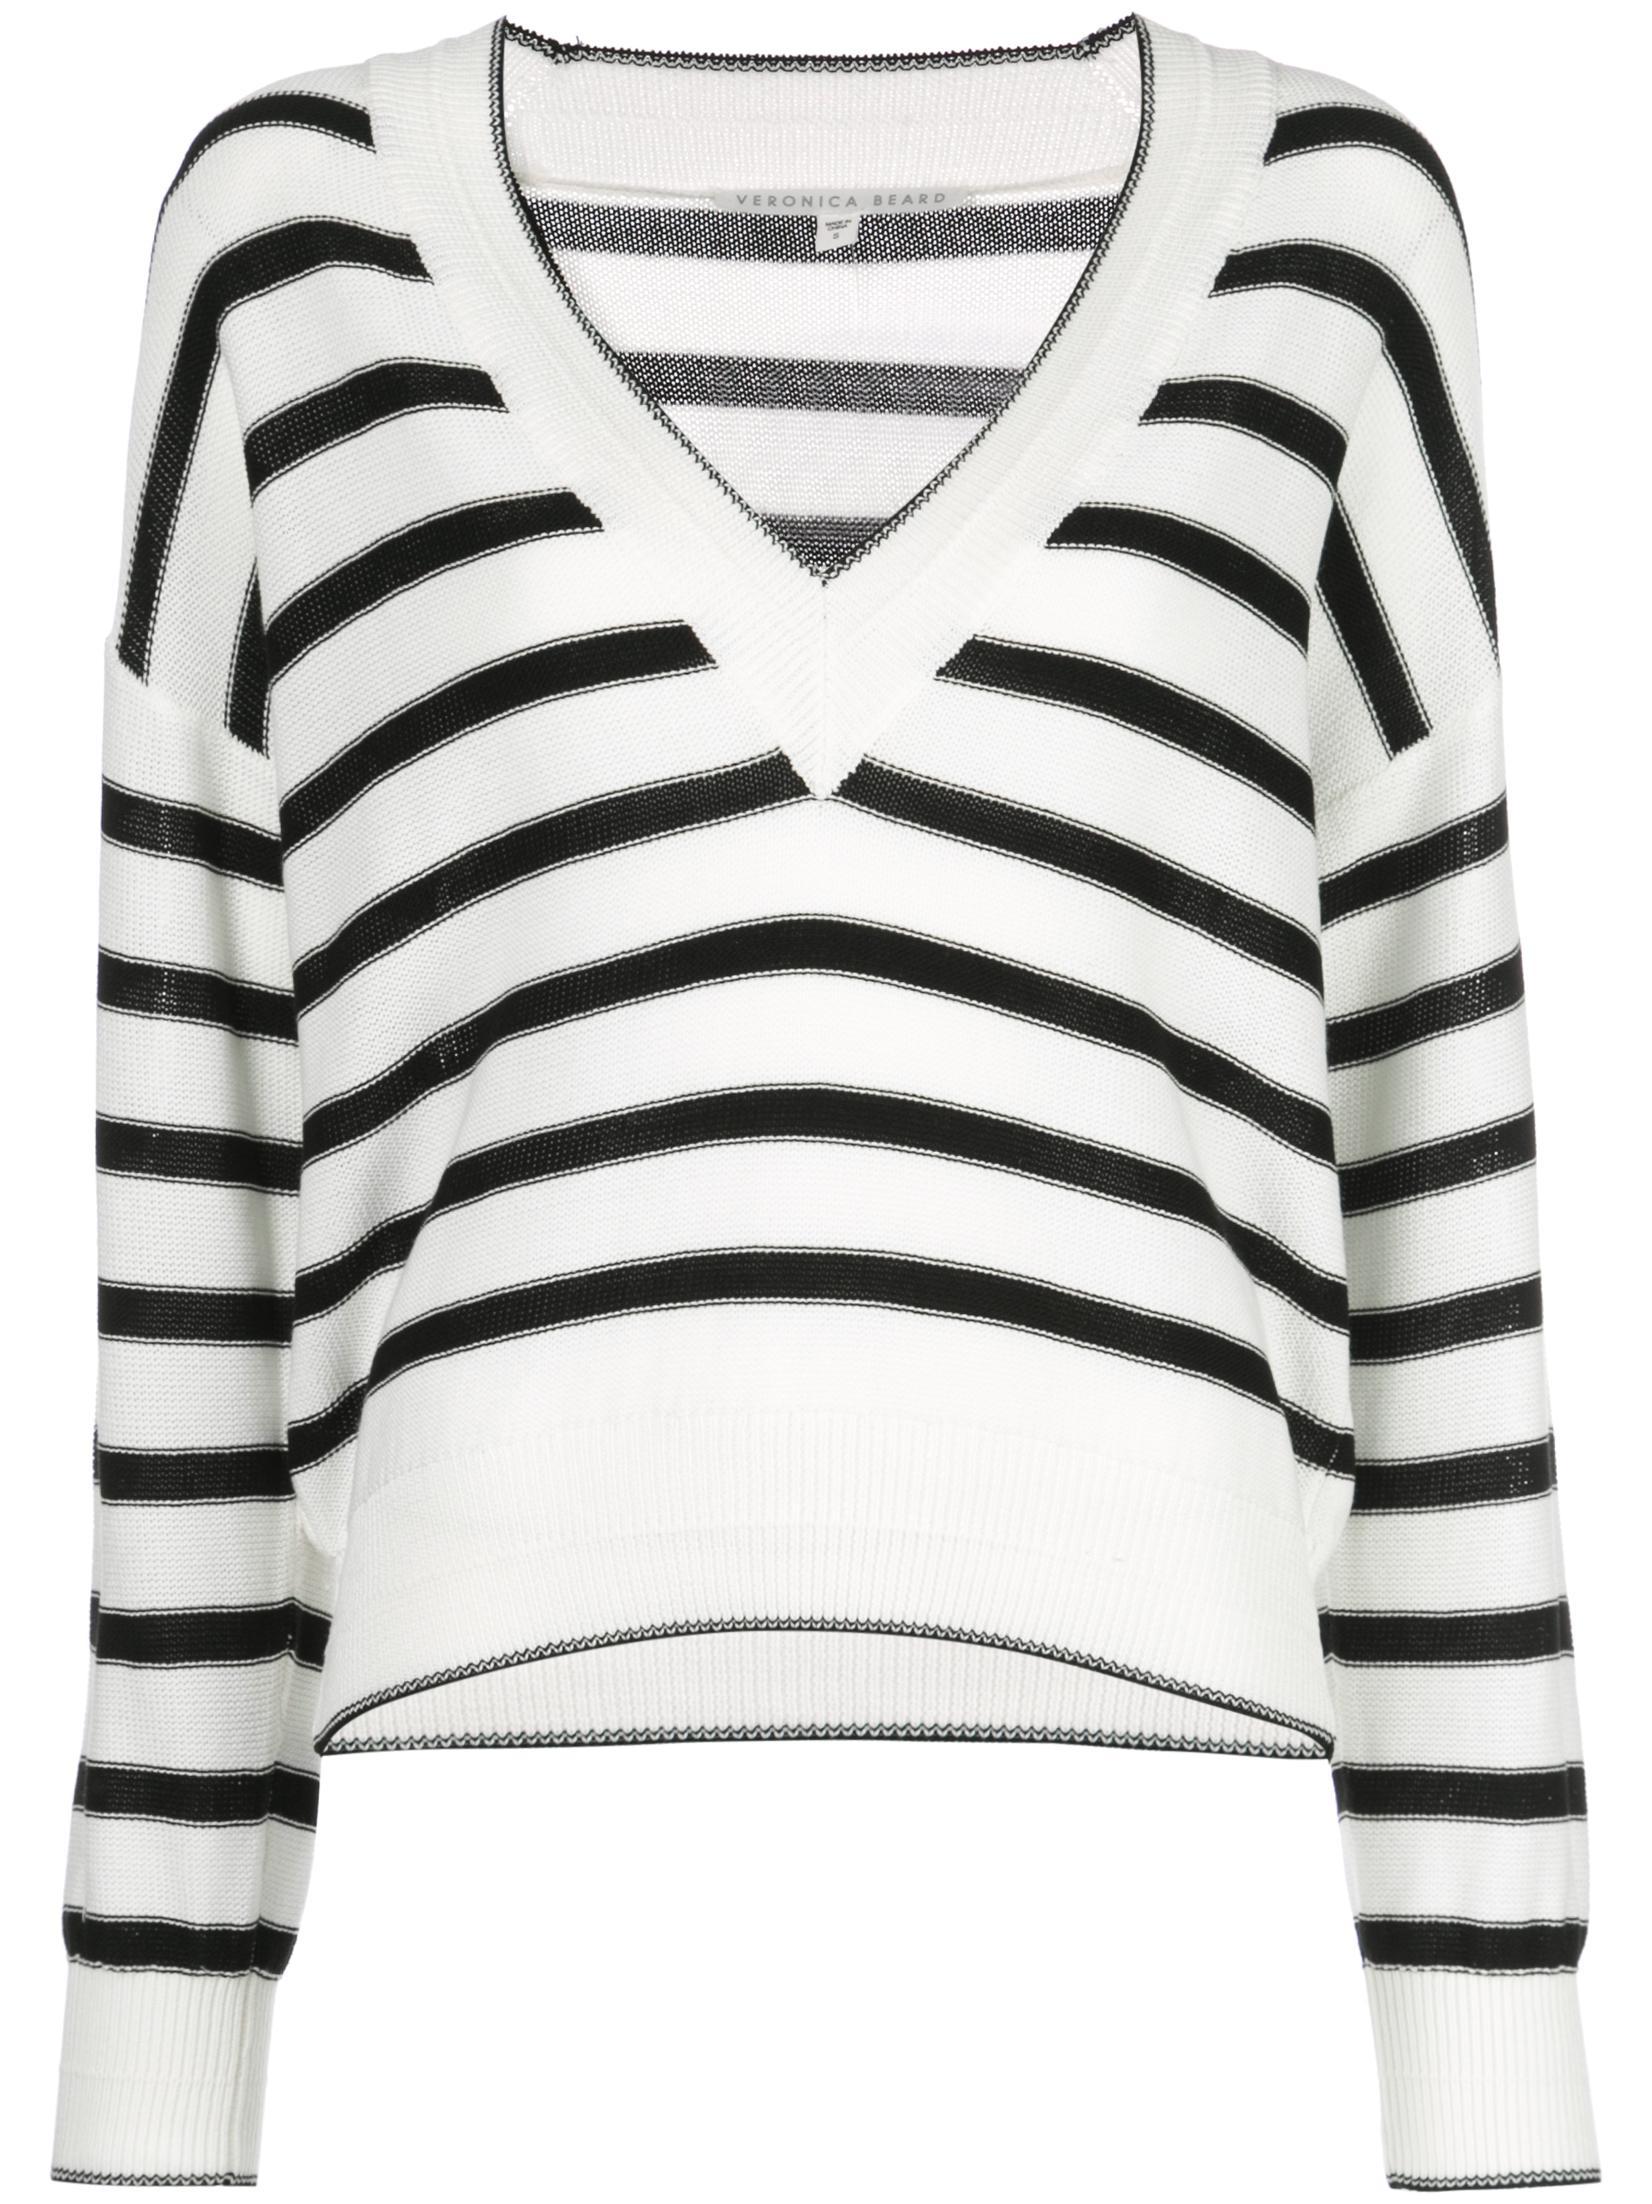 Jayden Long Sleeve Striped V- Neck Sweater Item # 1905KN4539308